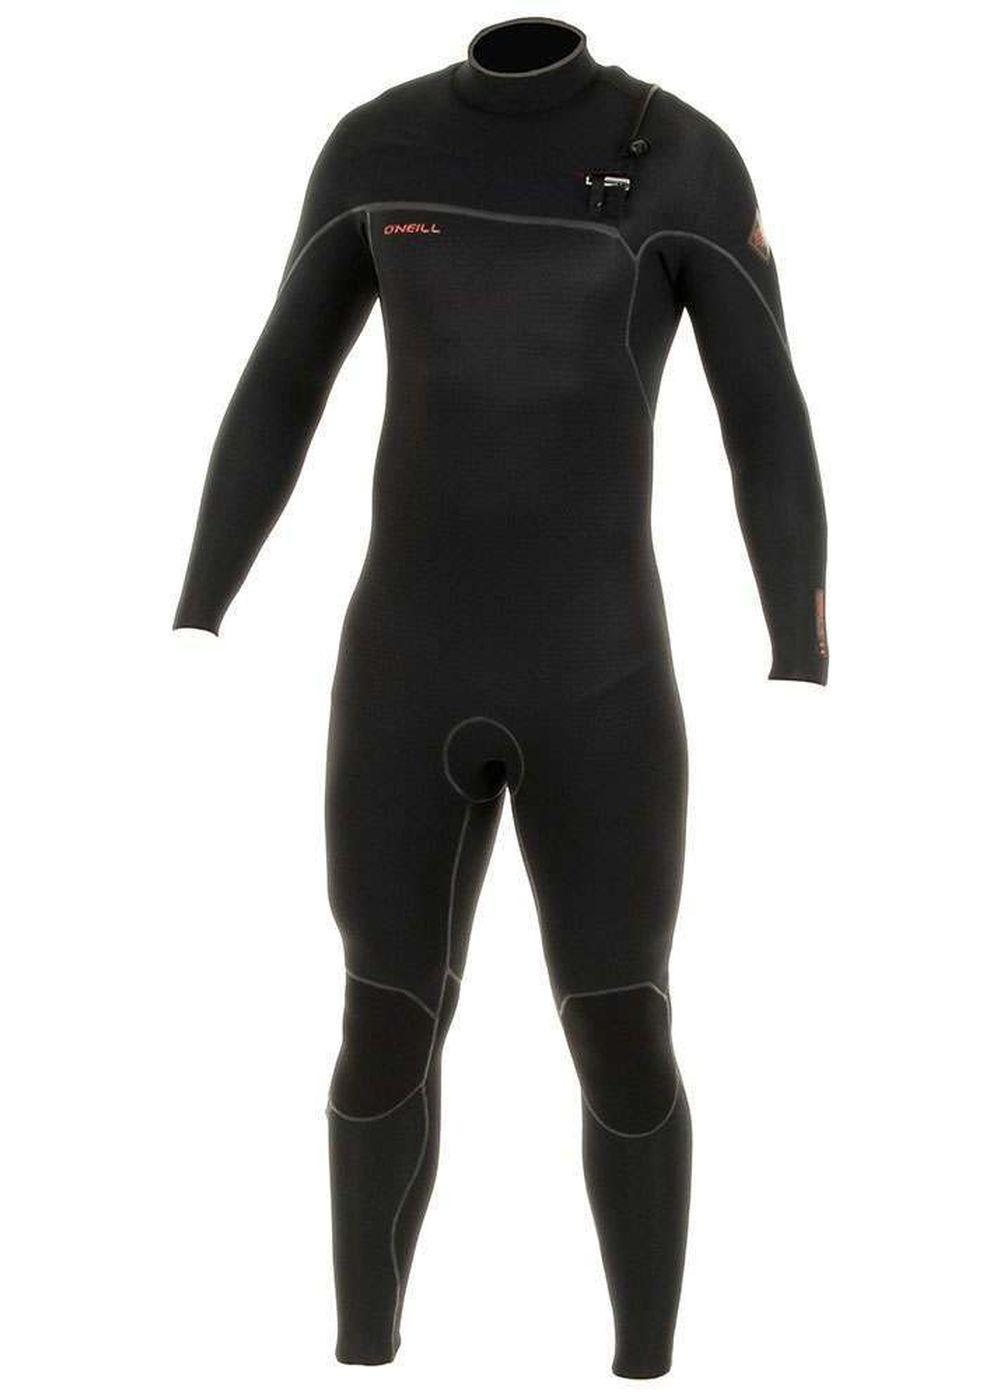 Oneill Freak Fz 5/4 Ssw Wetsuit 2017 Black Picture